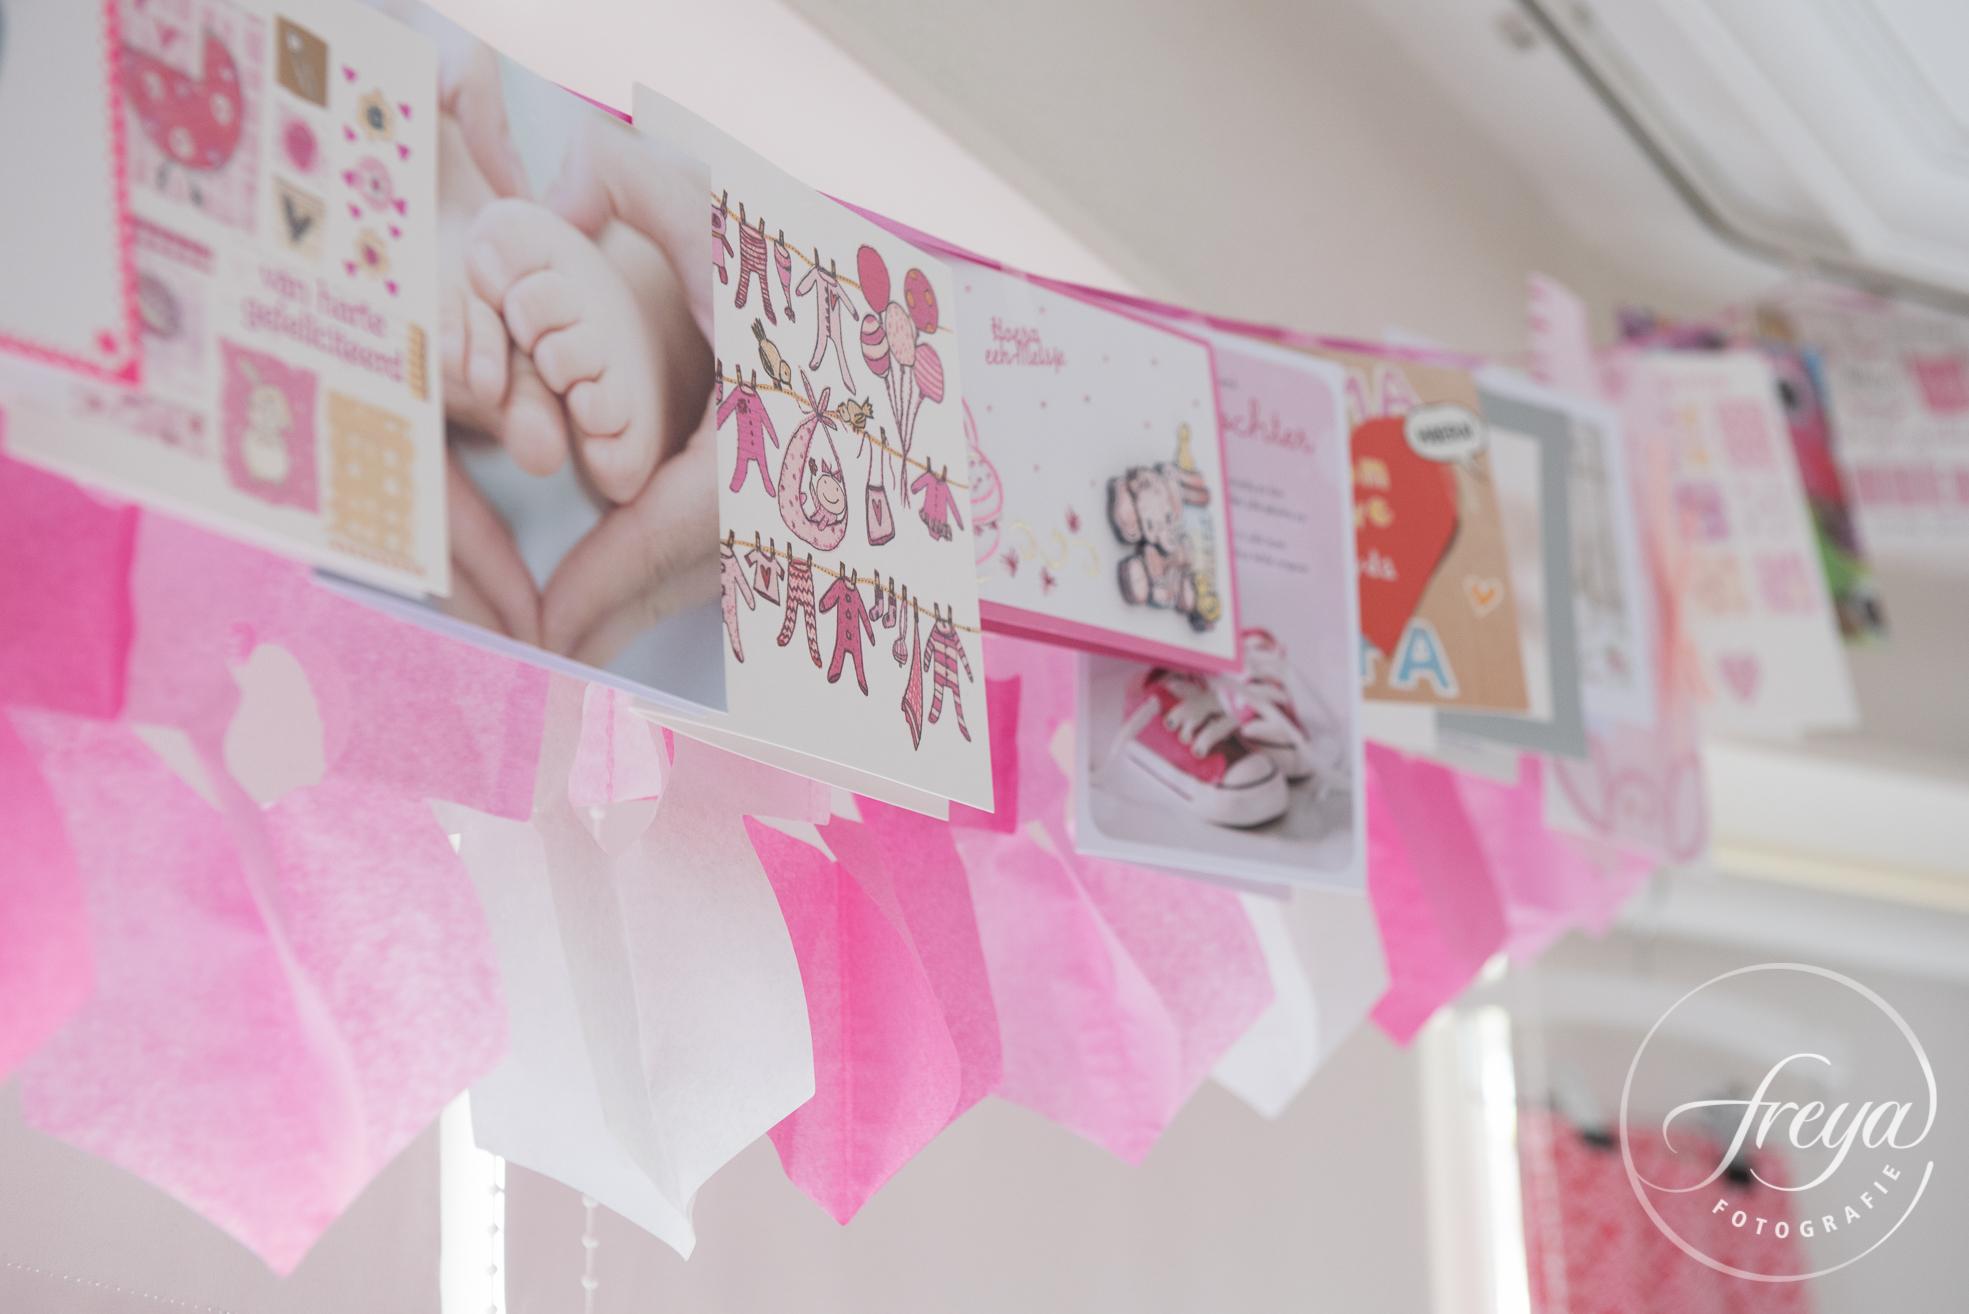 Newborn baby felicitatiekaarten - Trouwfotografie Freya - 002